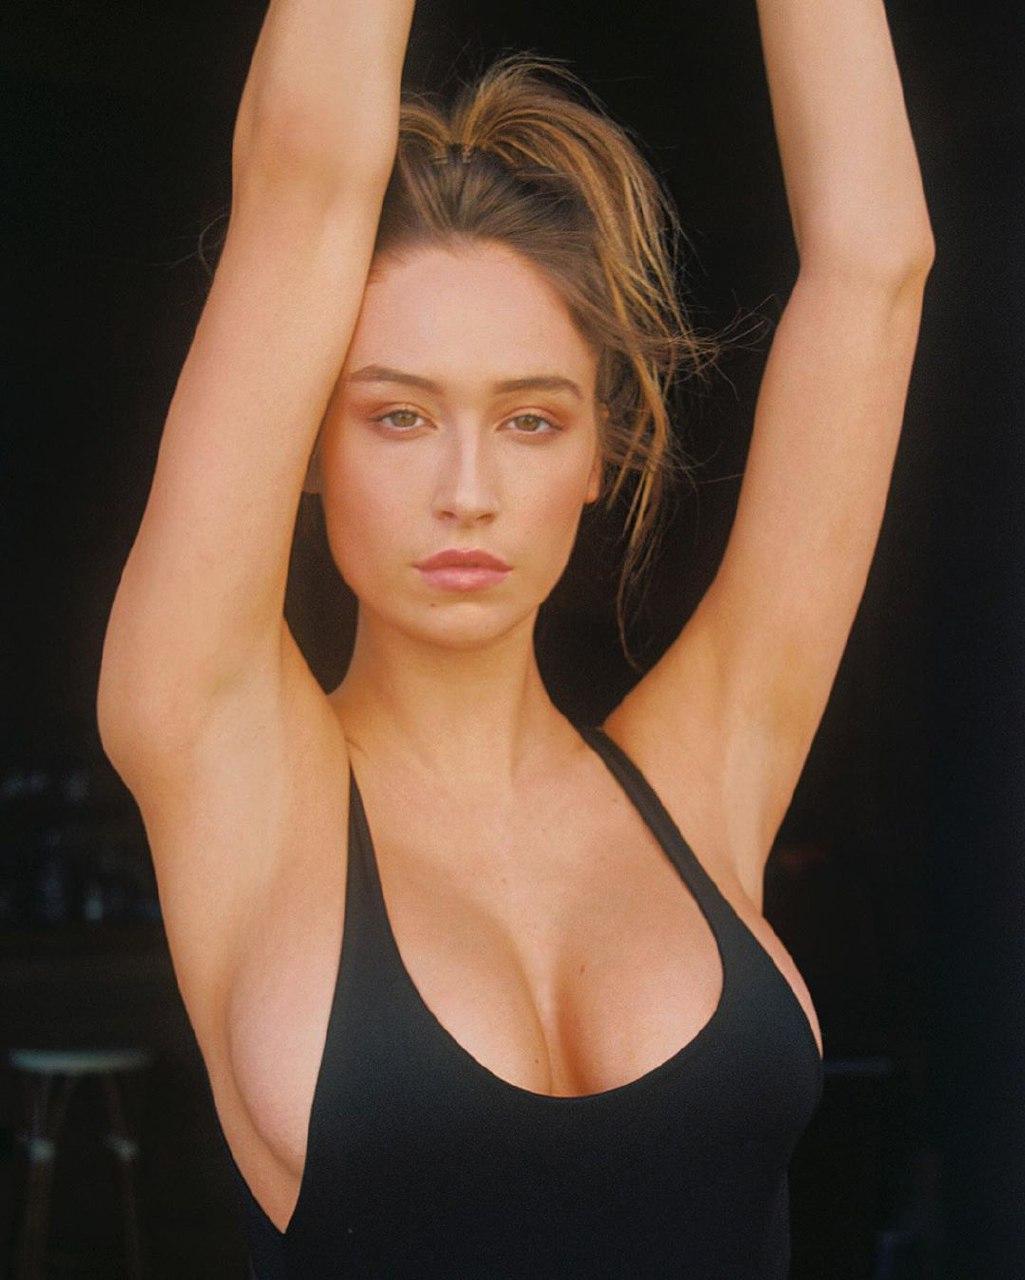 Elsie Hewitt body